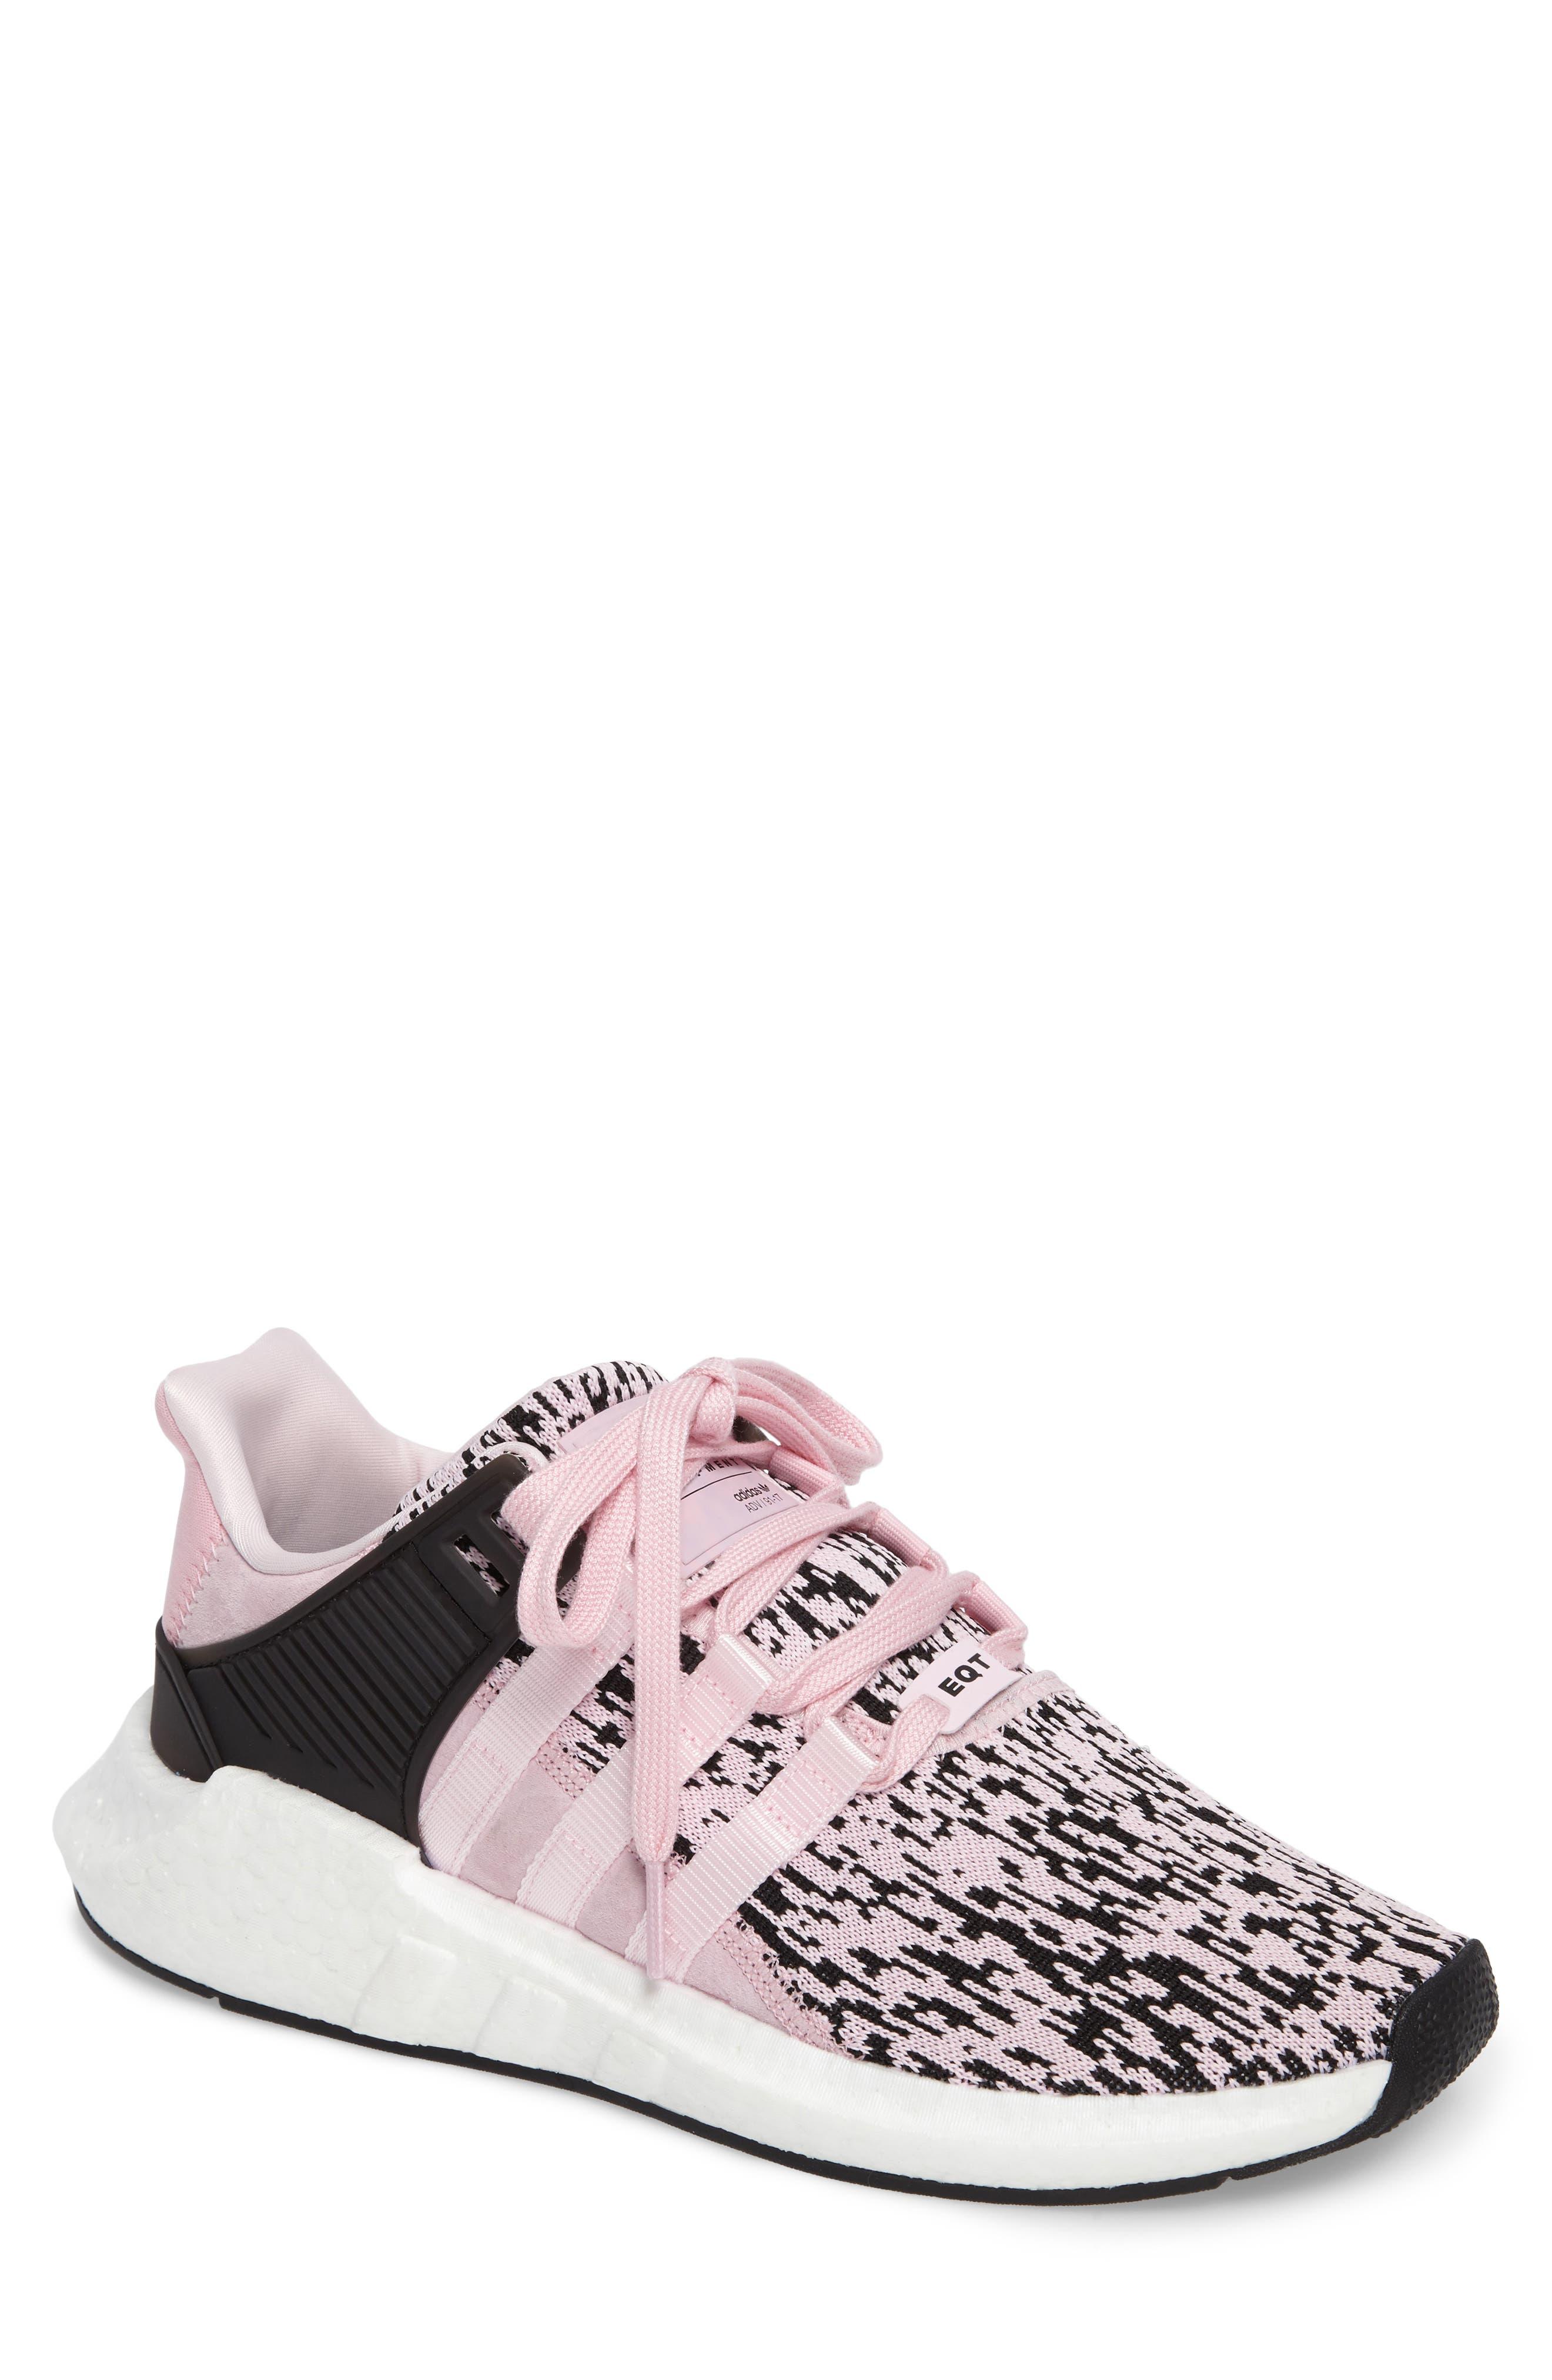 Main Image - adidas EQT Support 93/17 Sneaker (Men)